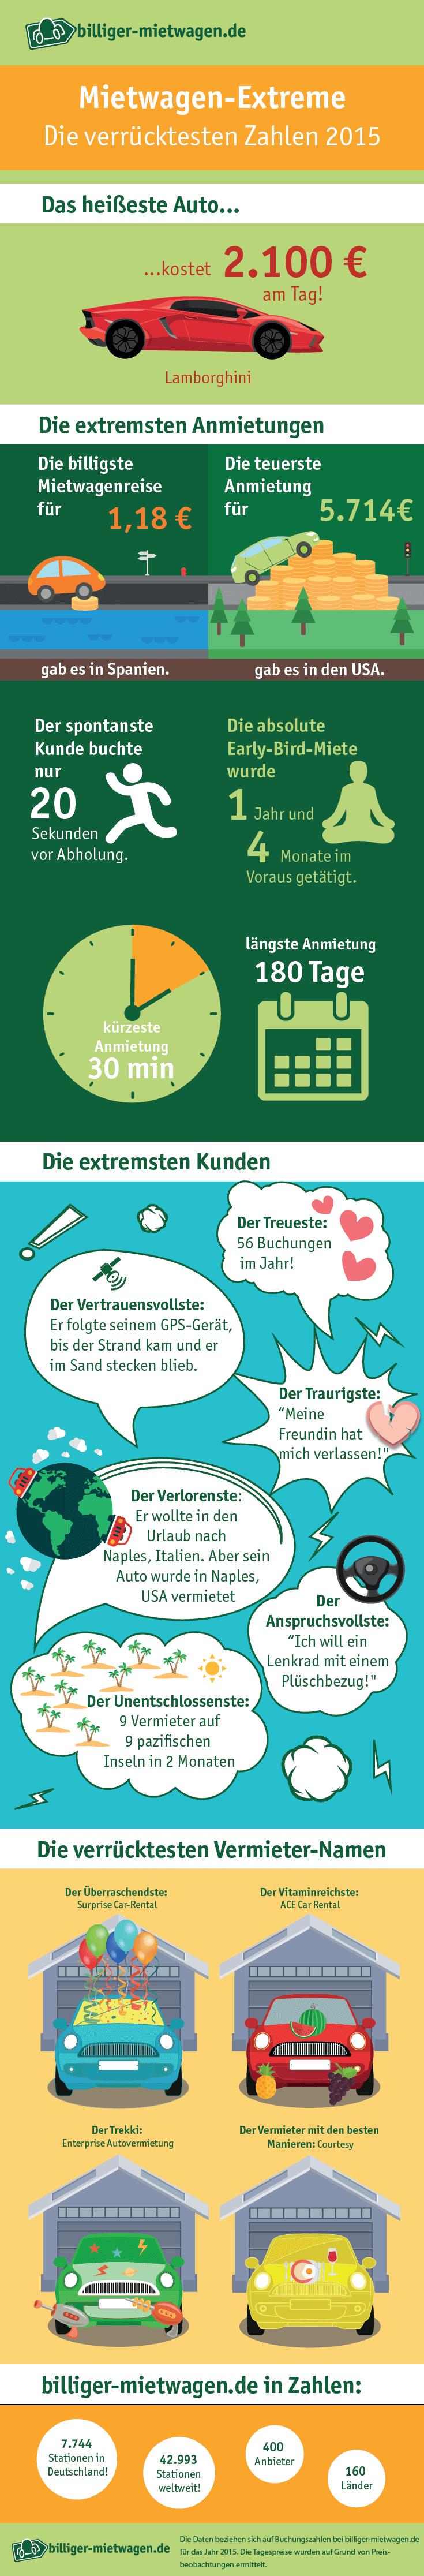 Infografik_BM_Extreme-numbers-2015_Final